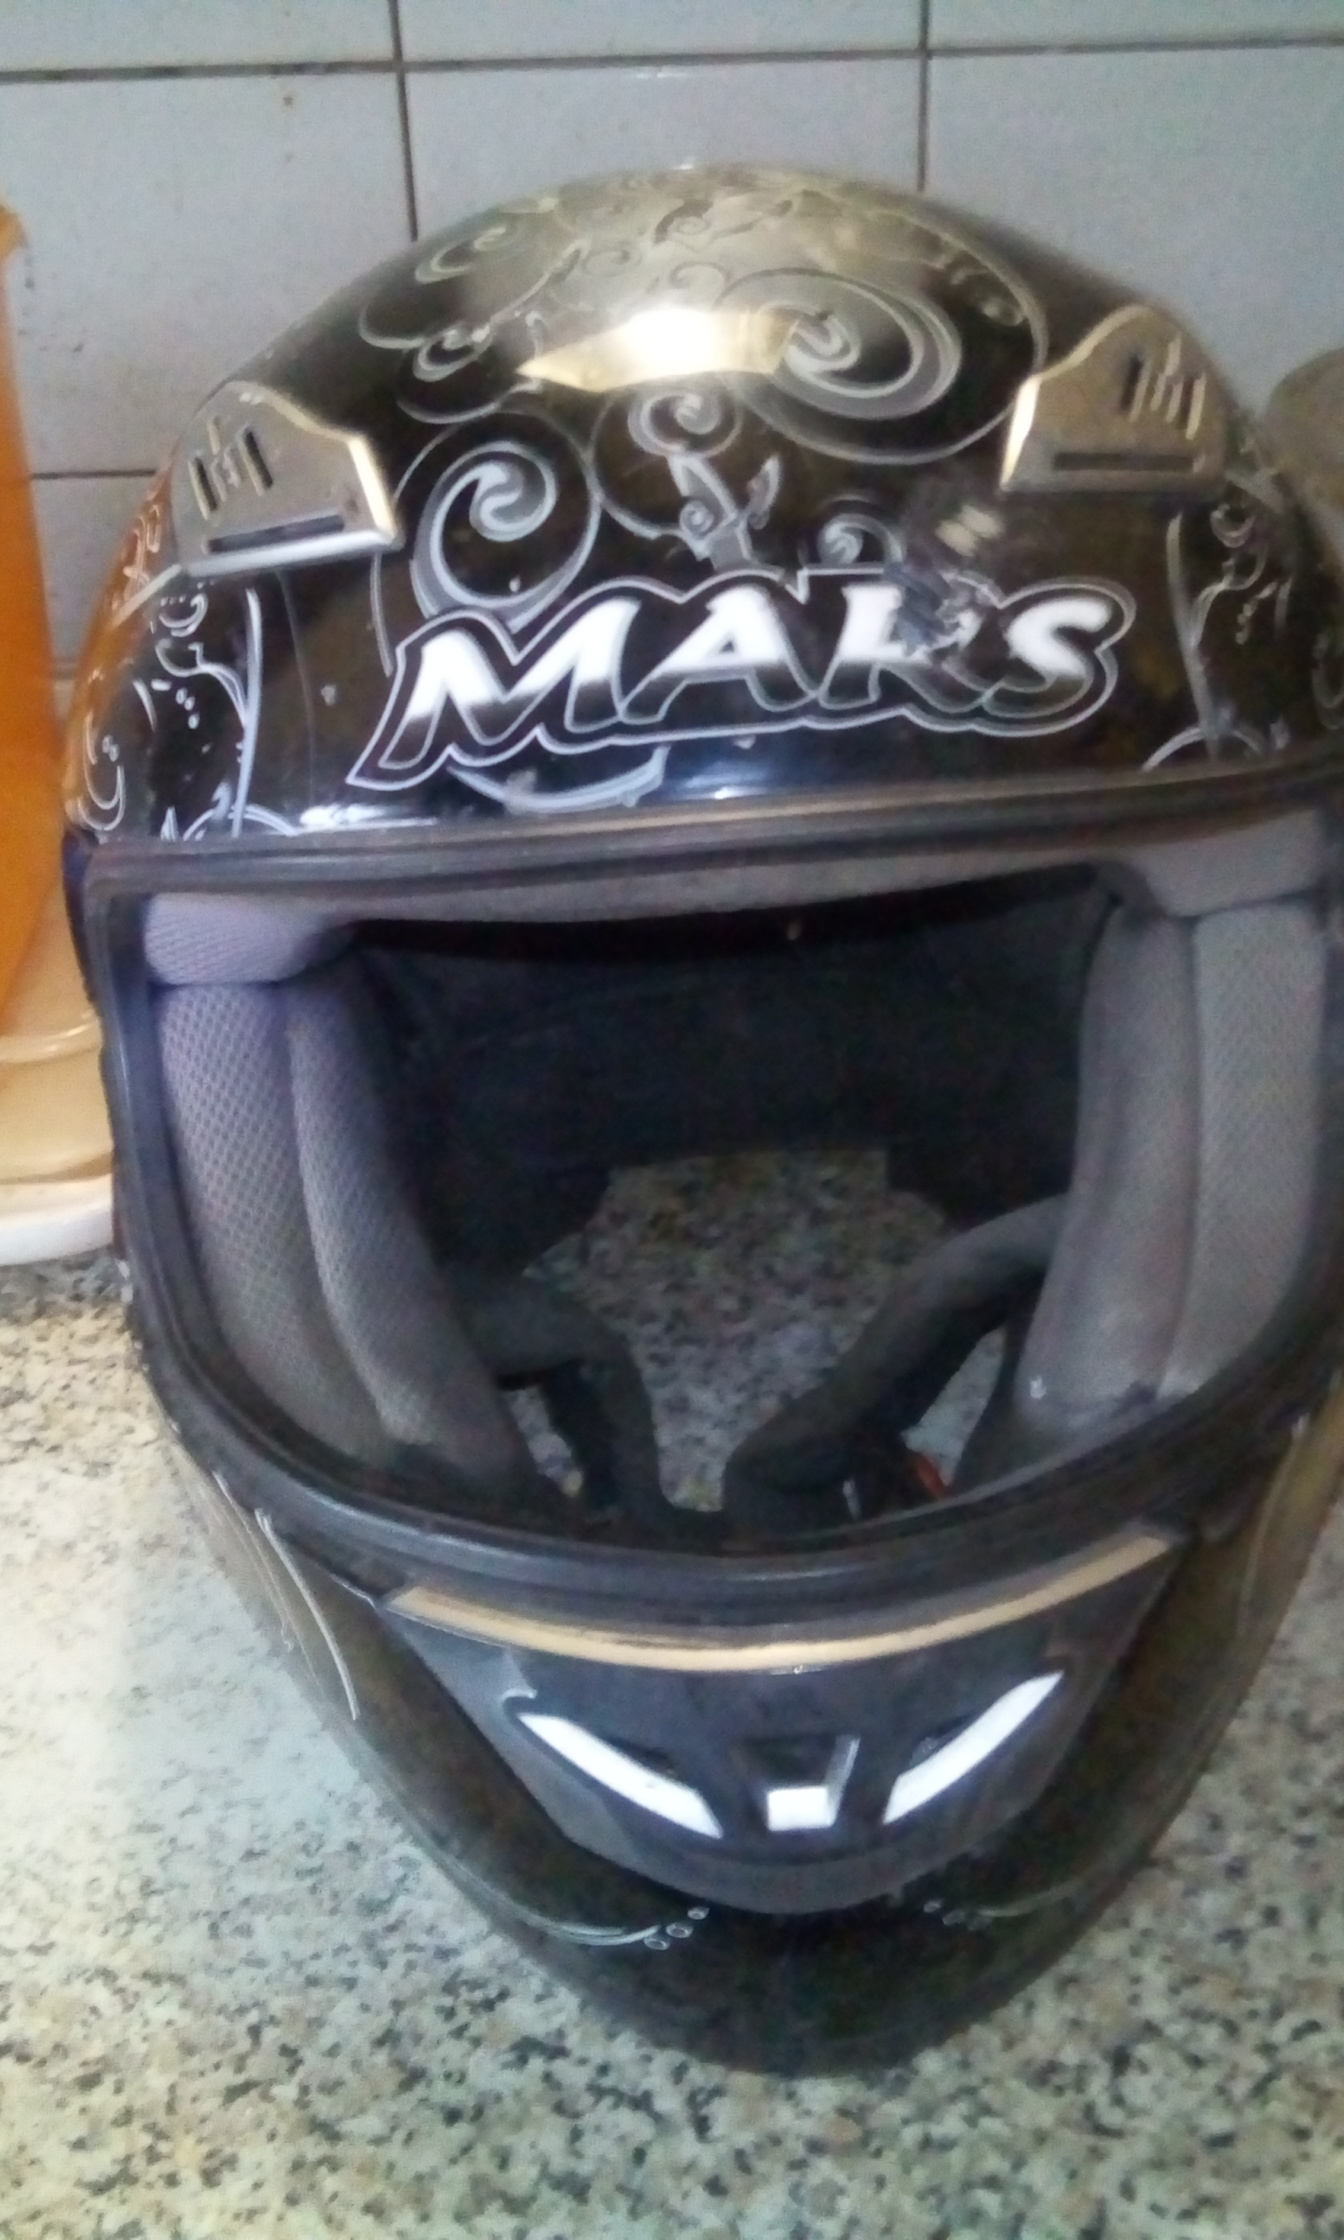 Motor Bike Helmet for sale. Good condition. Bike sold.